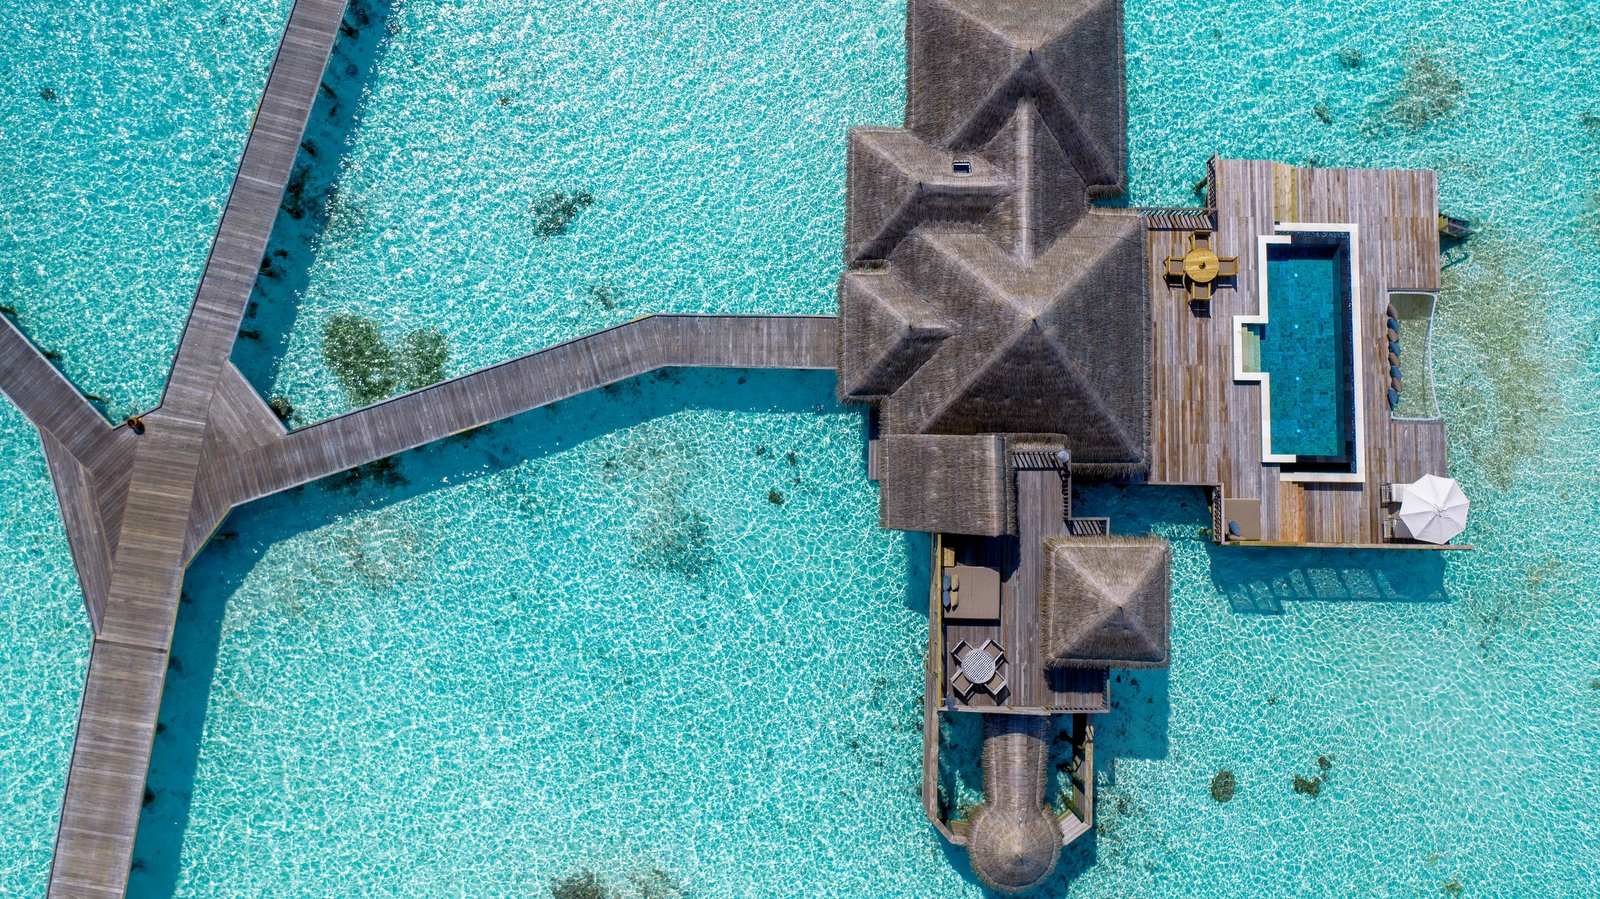 Мальдивы, отель Gili Lankanfushi Maldives, номер Residence with Pool